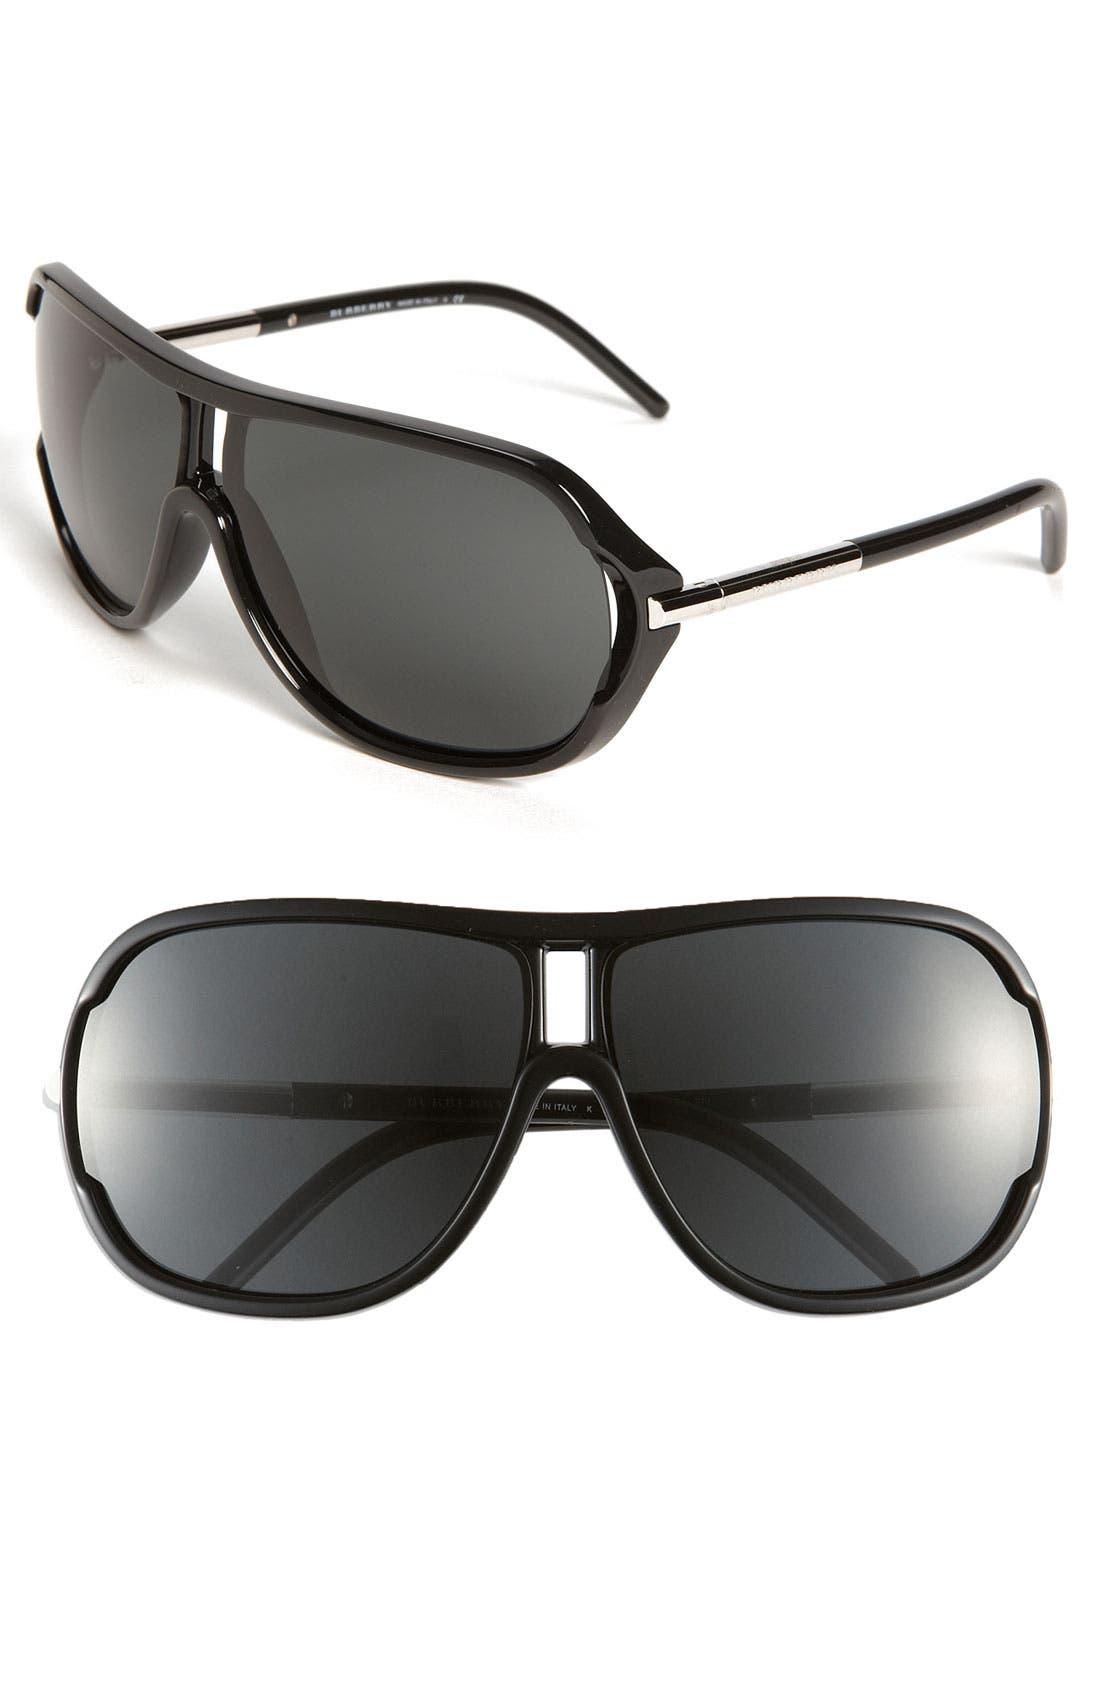 Main Image - Burberry Aviator Sunglasses